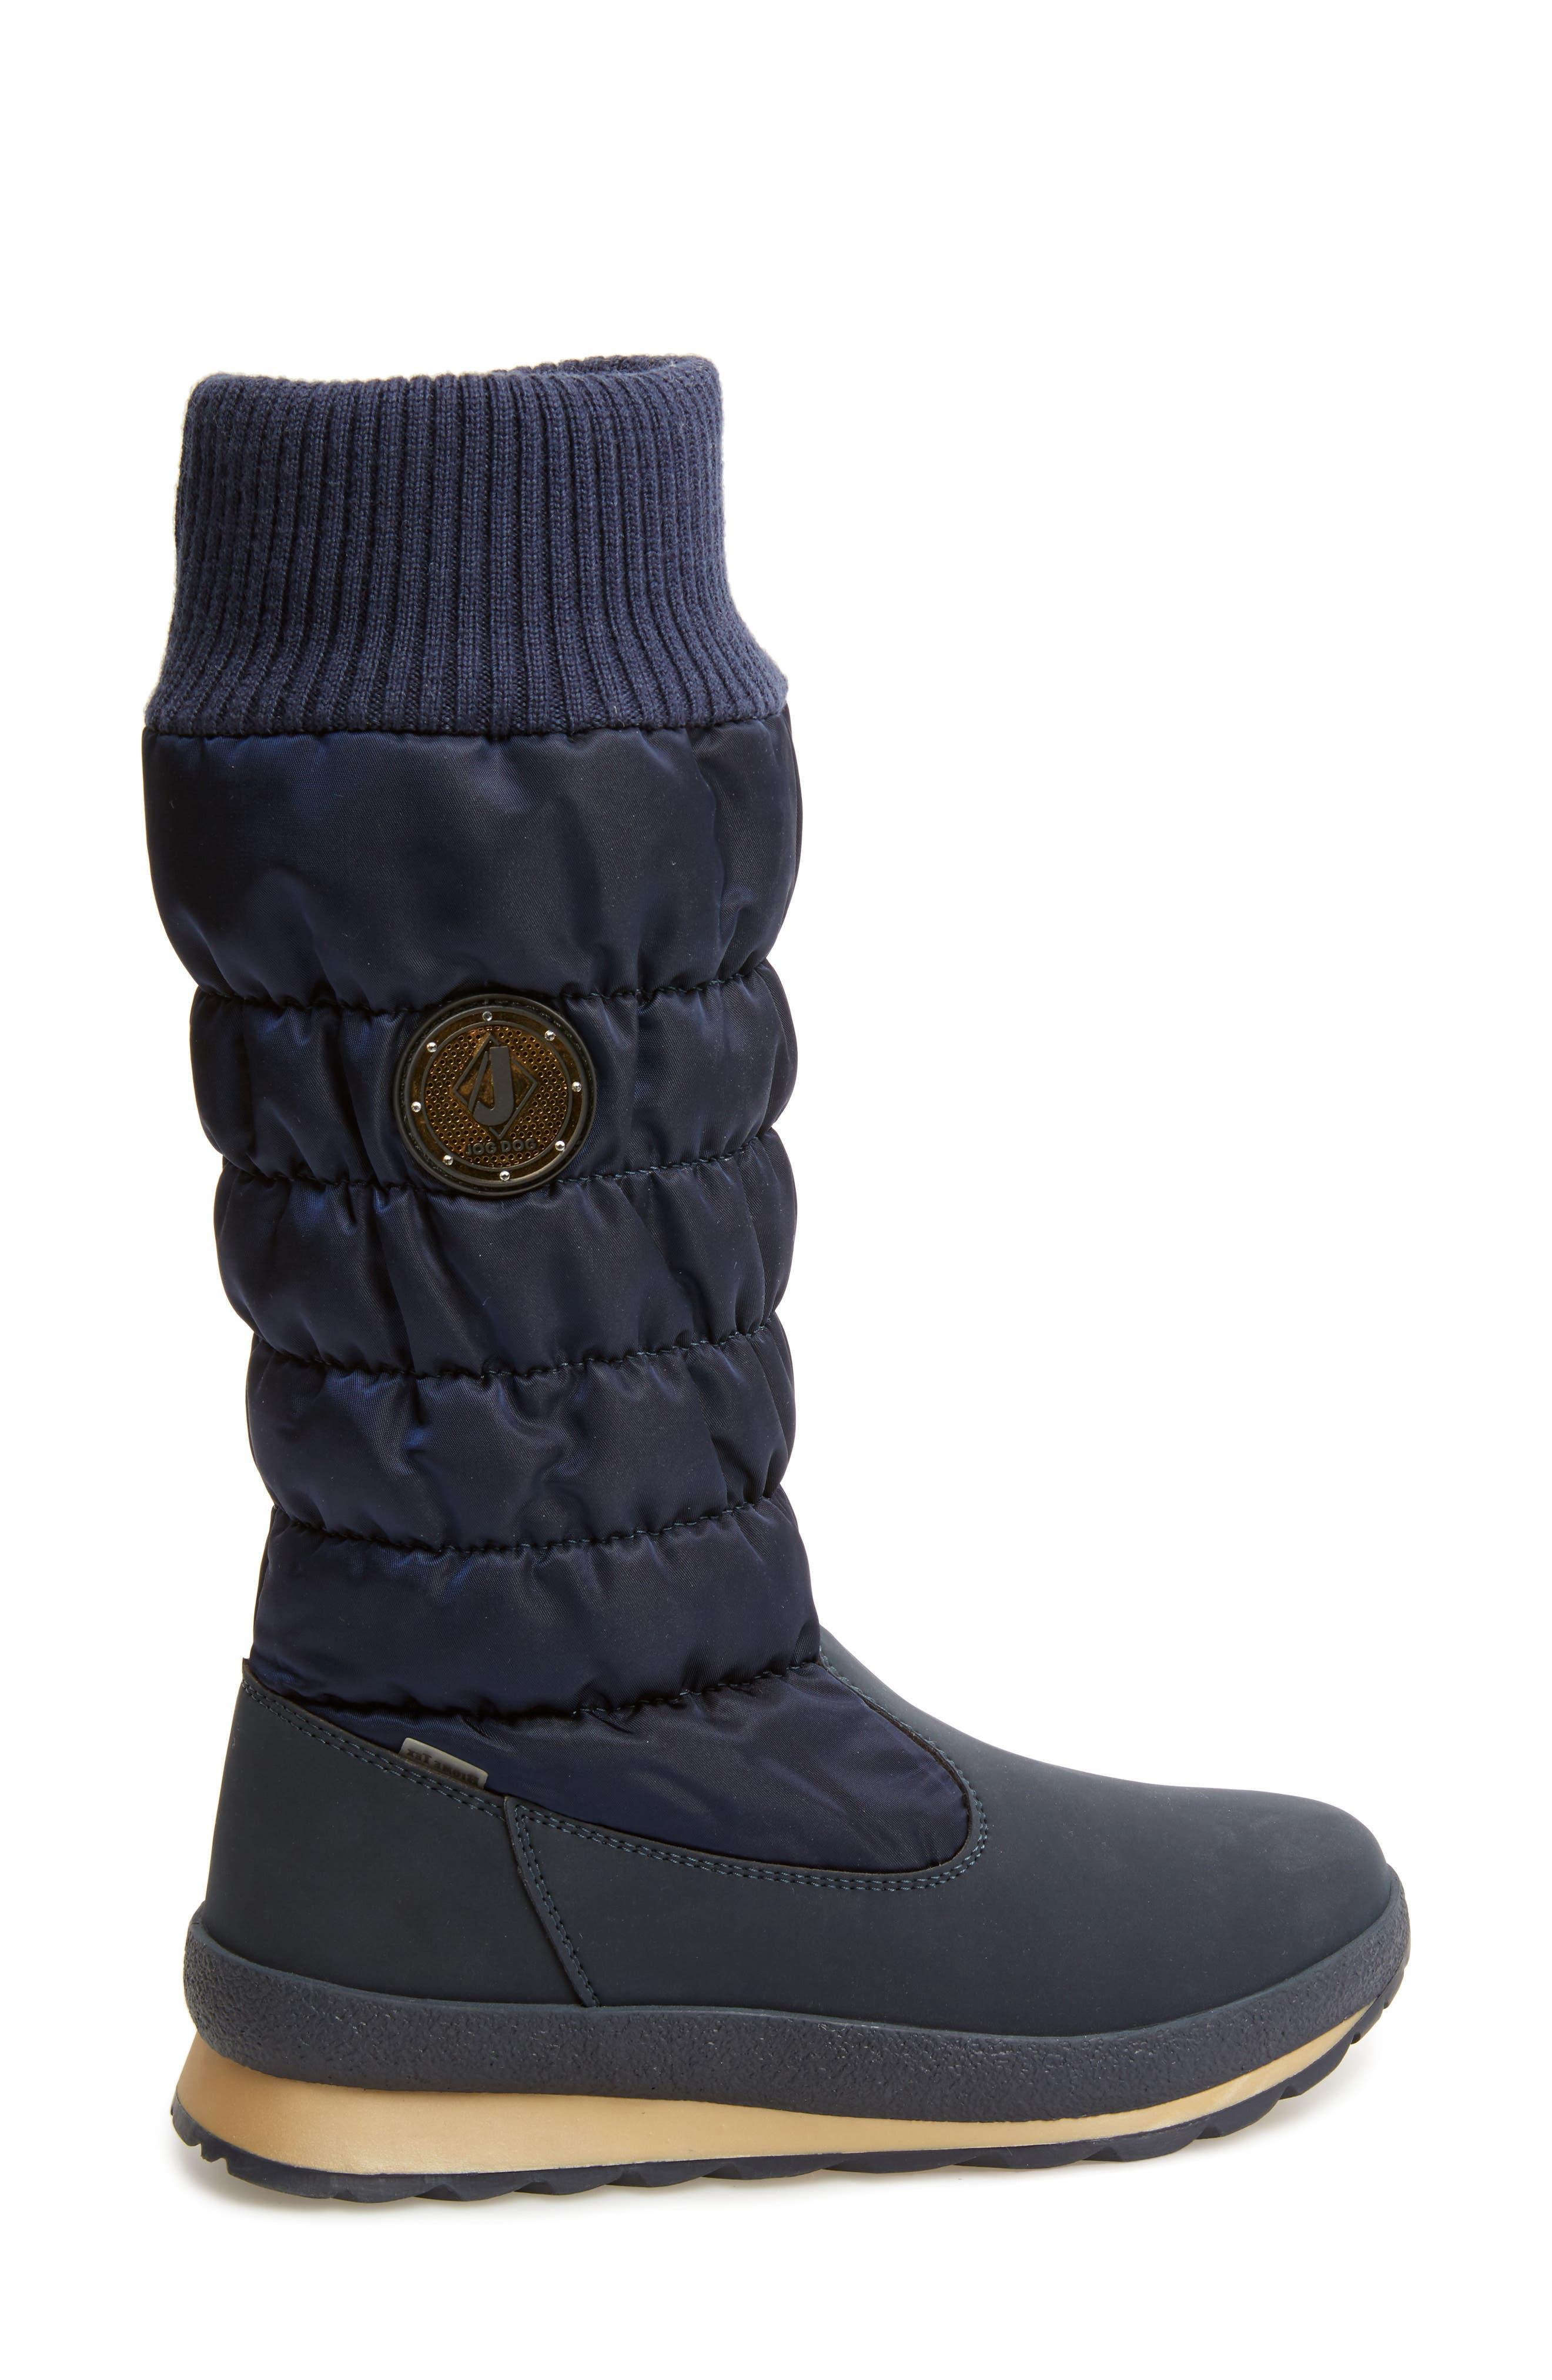 Alternate Image 3  - JOG DOG St. Anton Waterproof Winter Boot (Women)